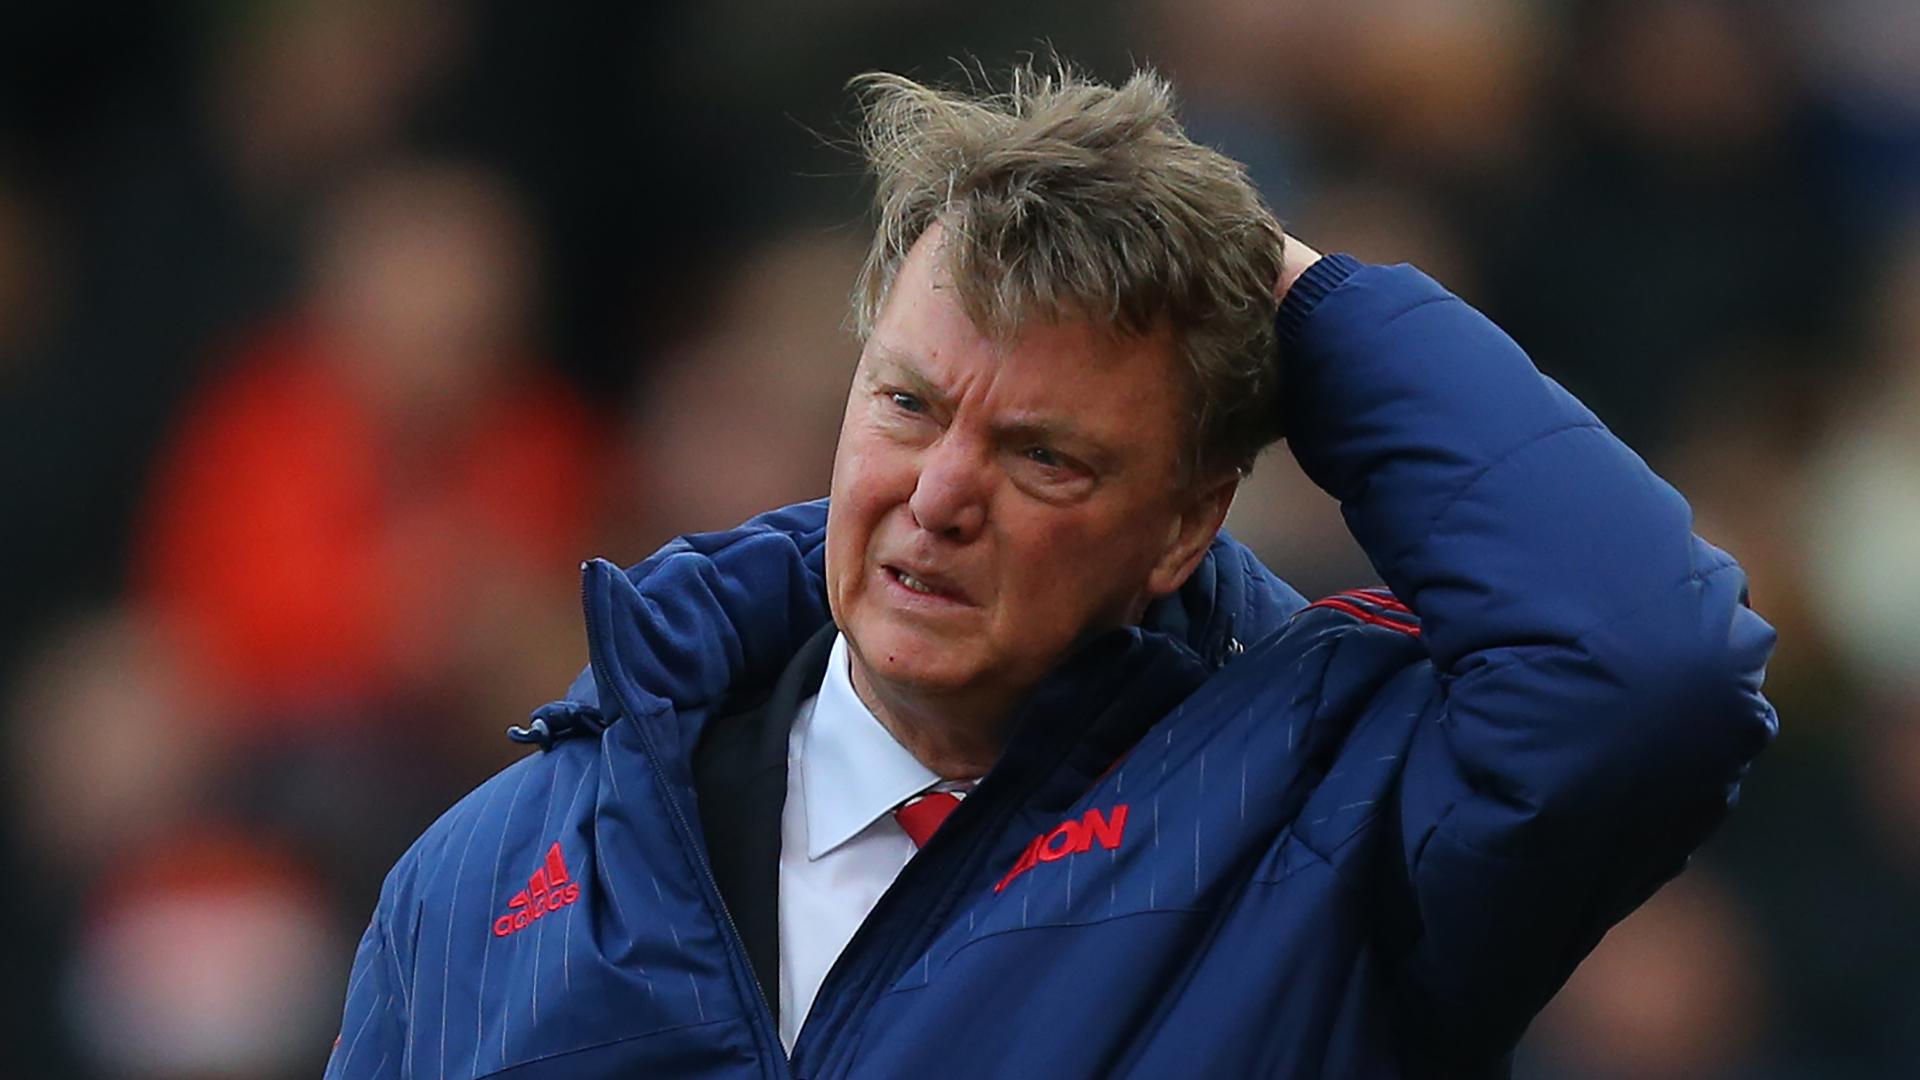 Man Utd Appoint Ole Gunnar Solskjaer: 'Louis Van Gaal's